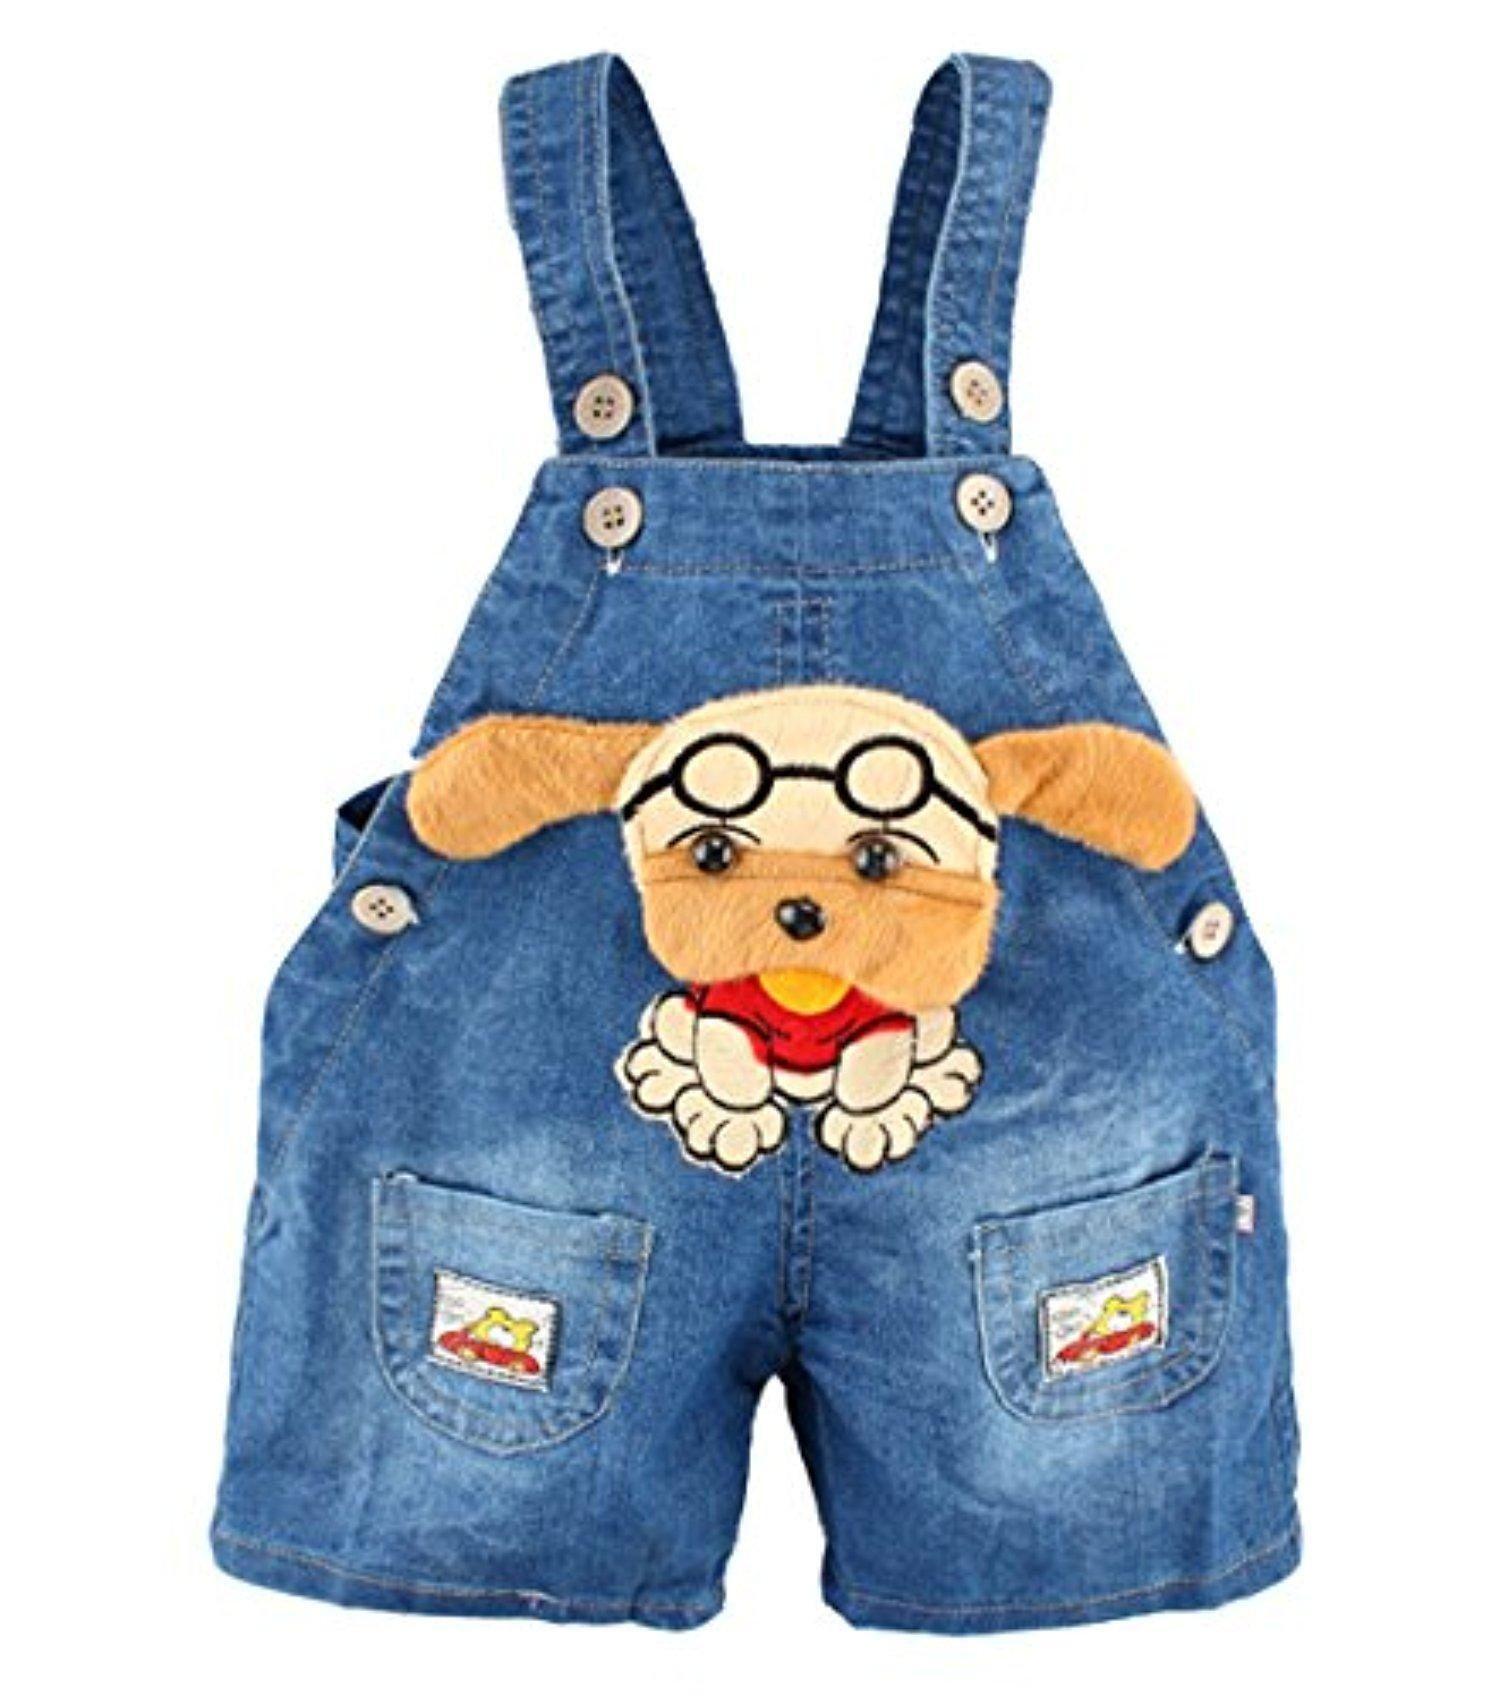 Kidscool Baby Summer Cotton Denim 3D Cartoon Cat Soft to Wear Overalls